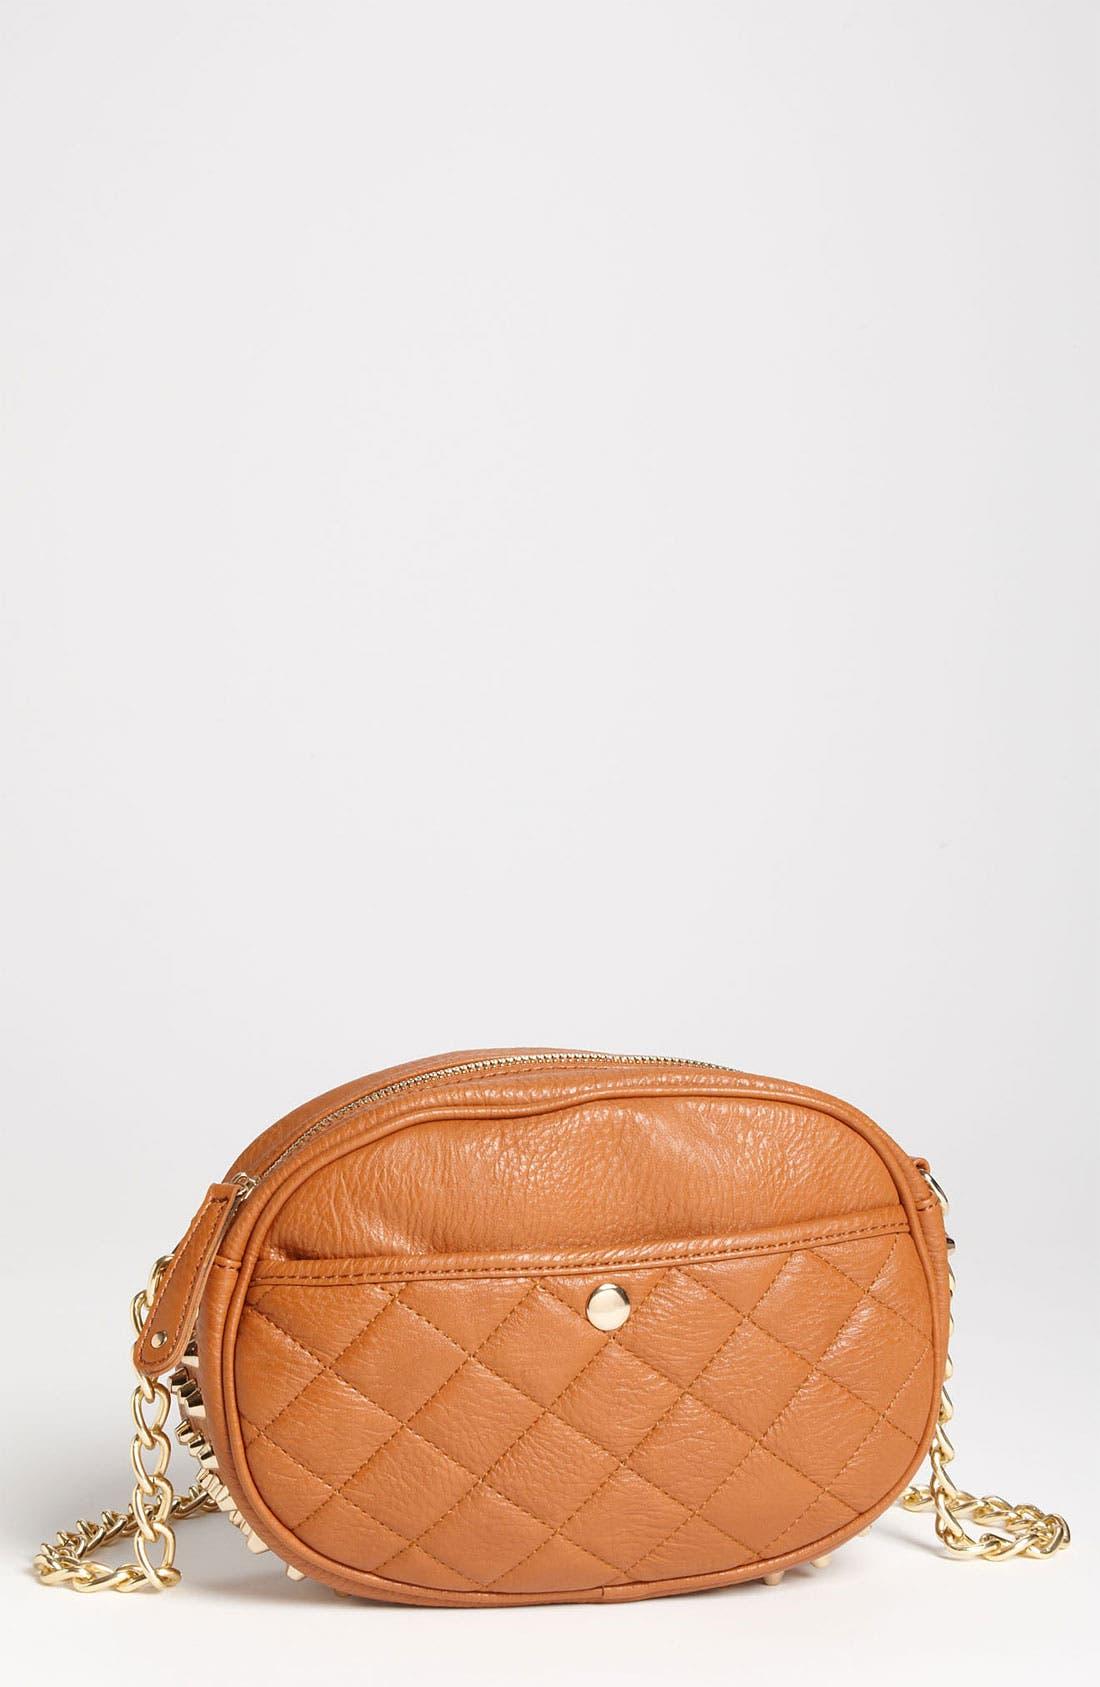 Main Image - Street Level Studded Crossbody Bag